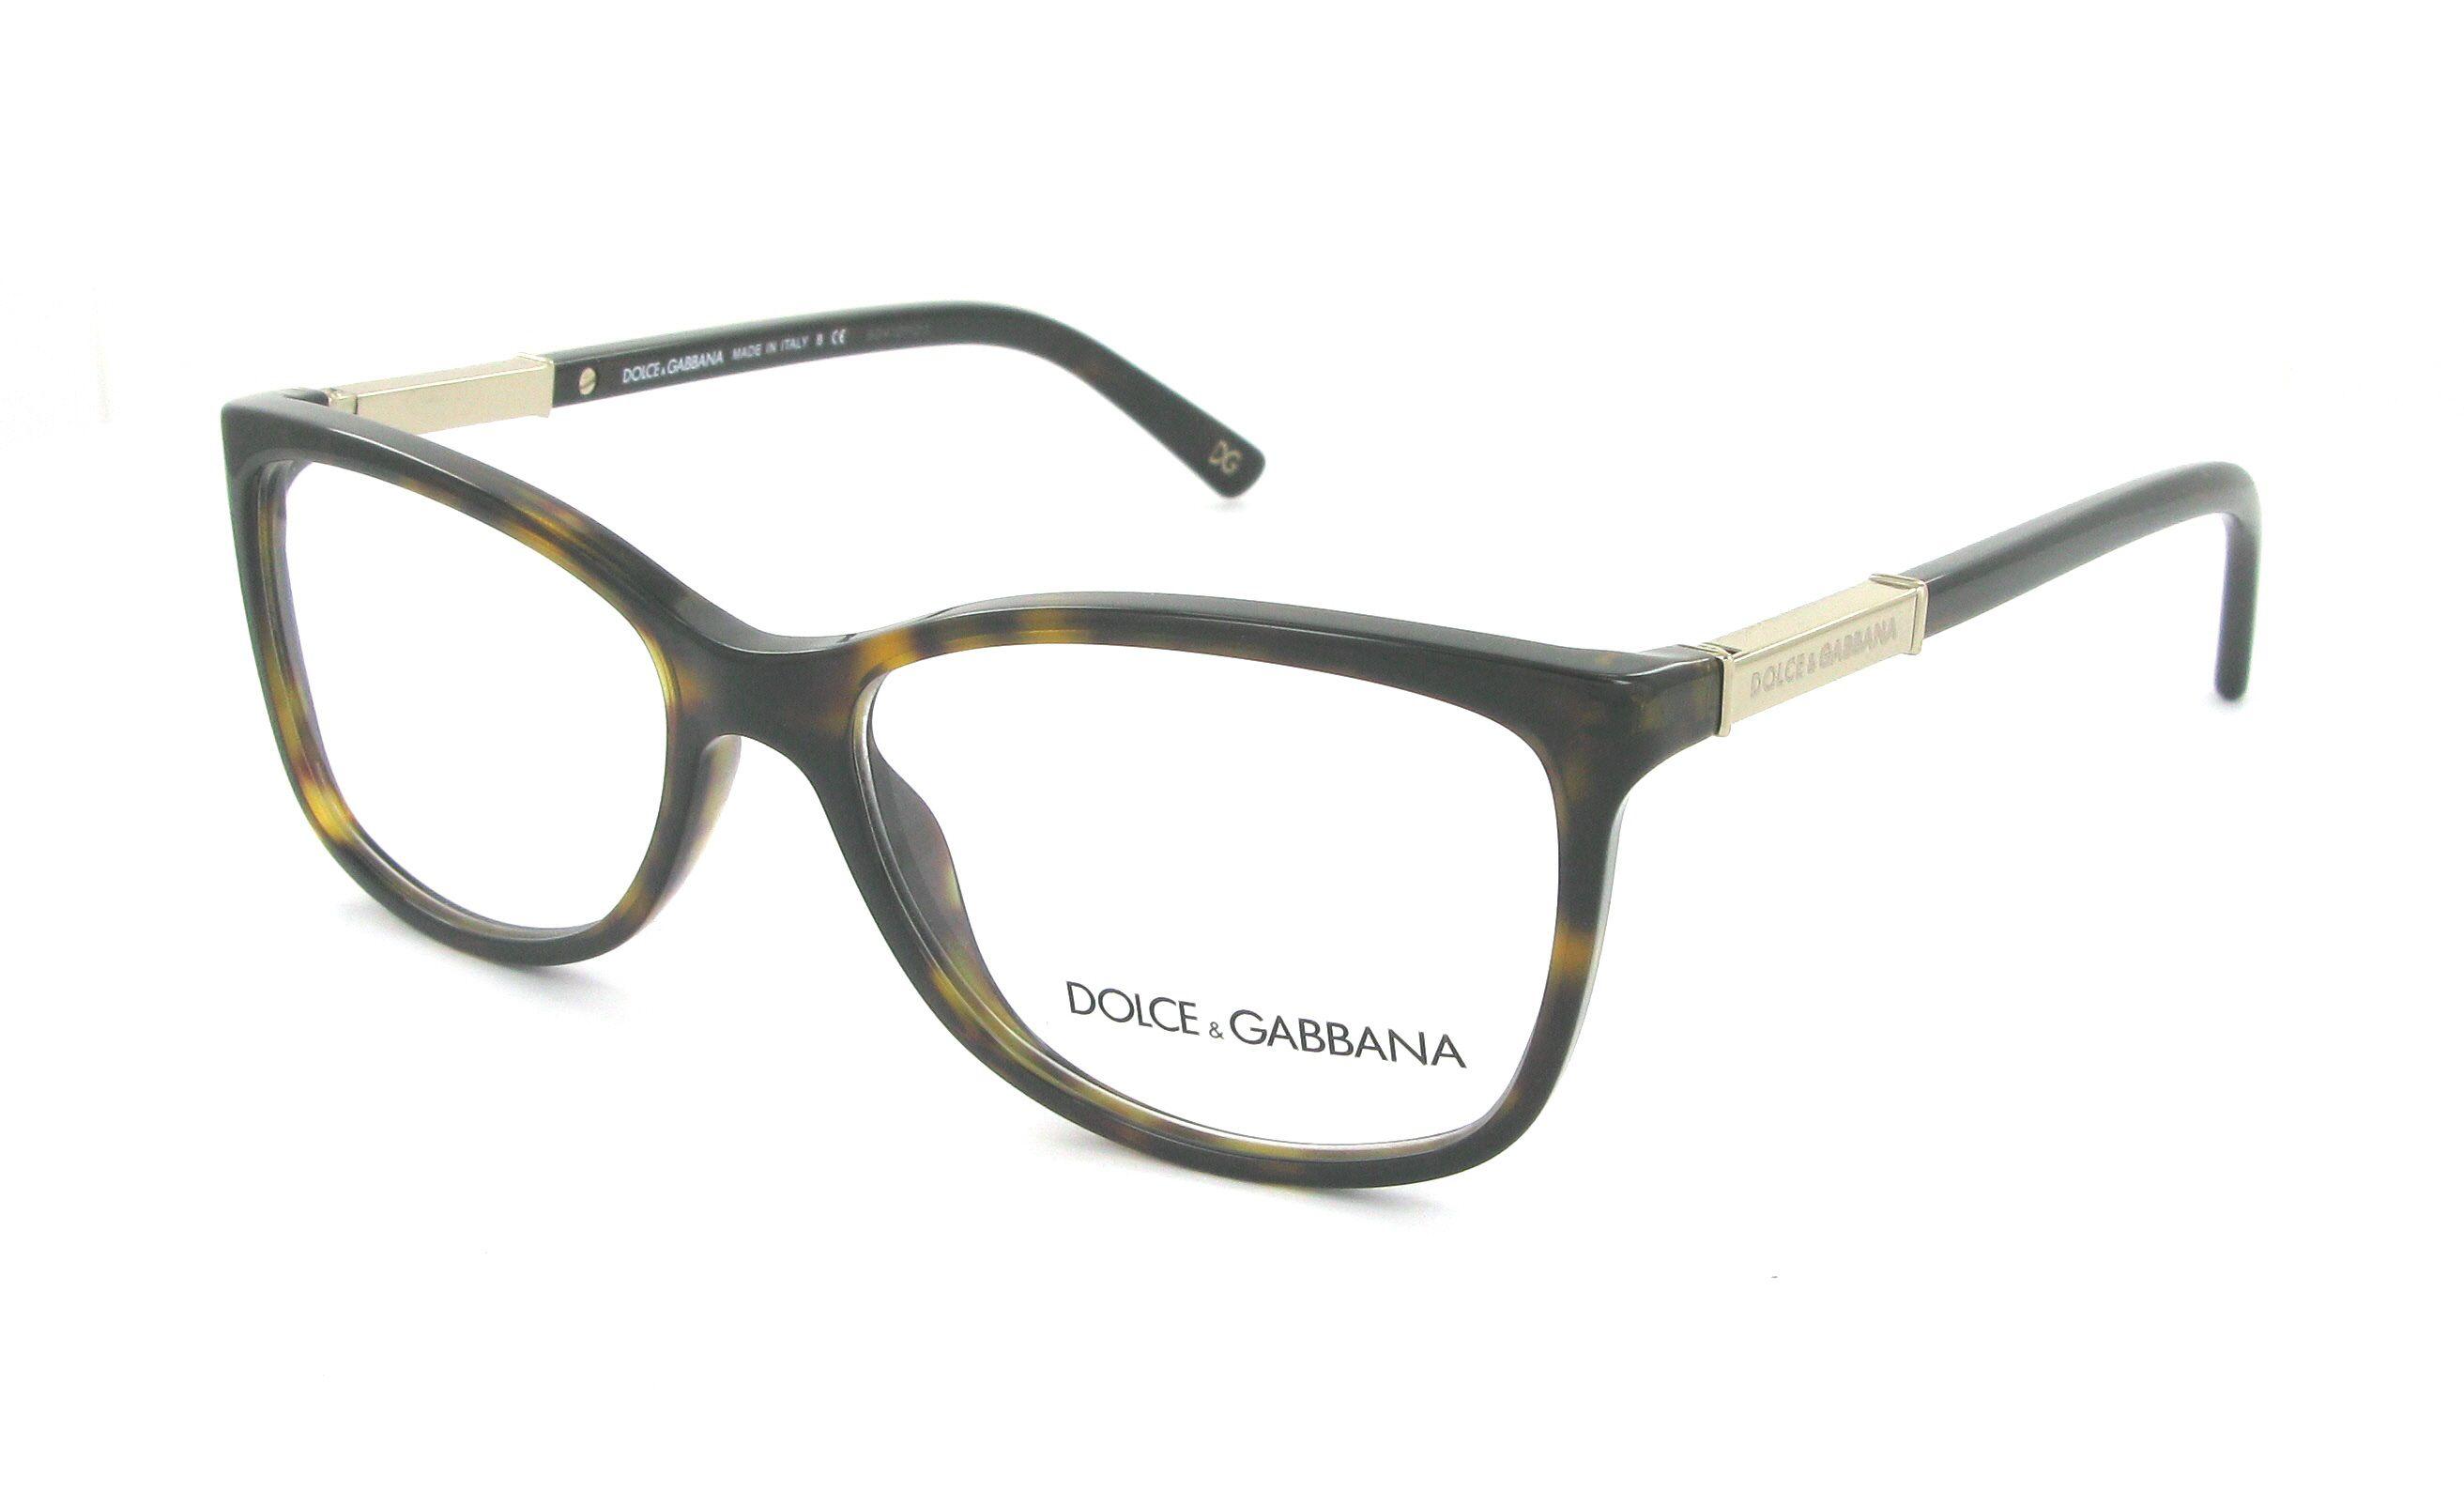 5120Lunettes 501 Glass Dolceamp; Et Glasses Gabbana Dg 3262 dWrBoCxe